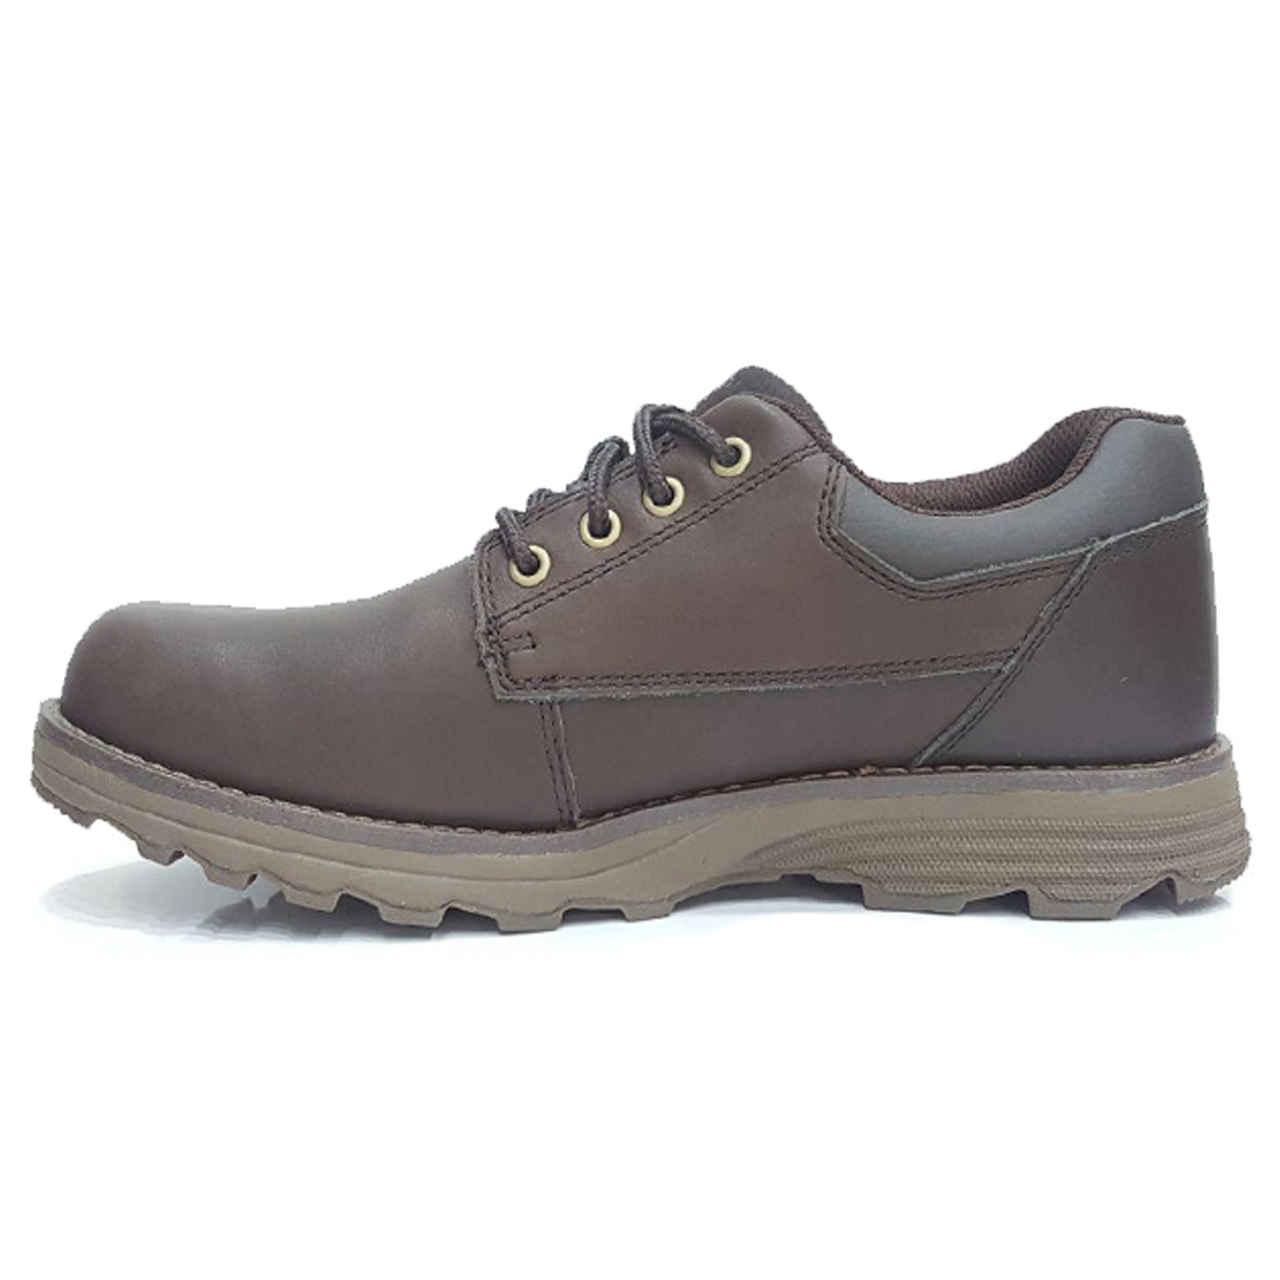 قیمت کفش راحتی چرم مردانه کاترپیلار مدل 676 Summon